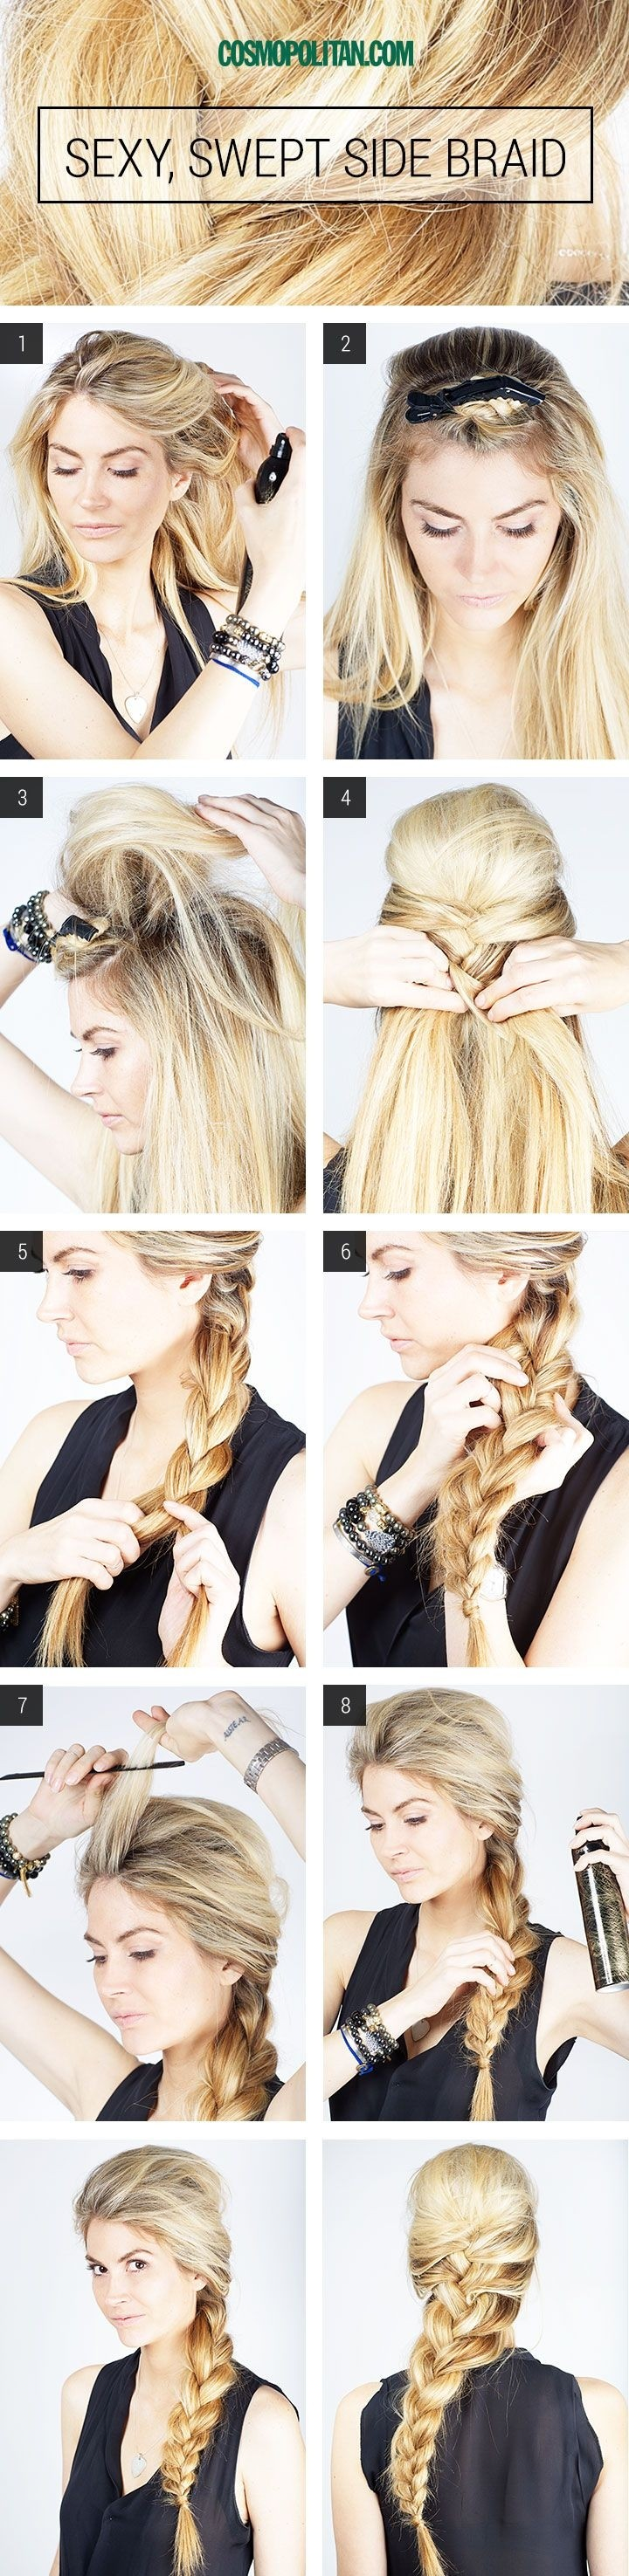 10 french braids hairstyles tutorials: everyday hair styles